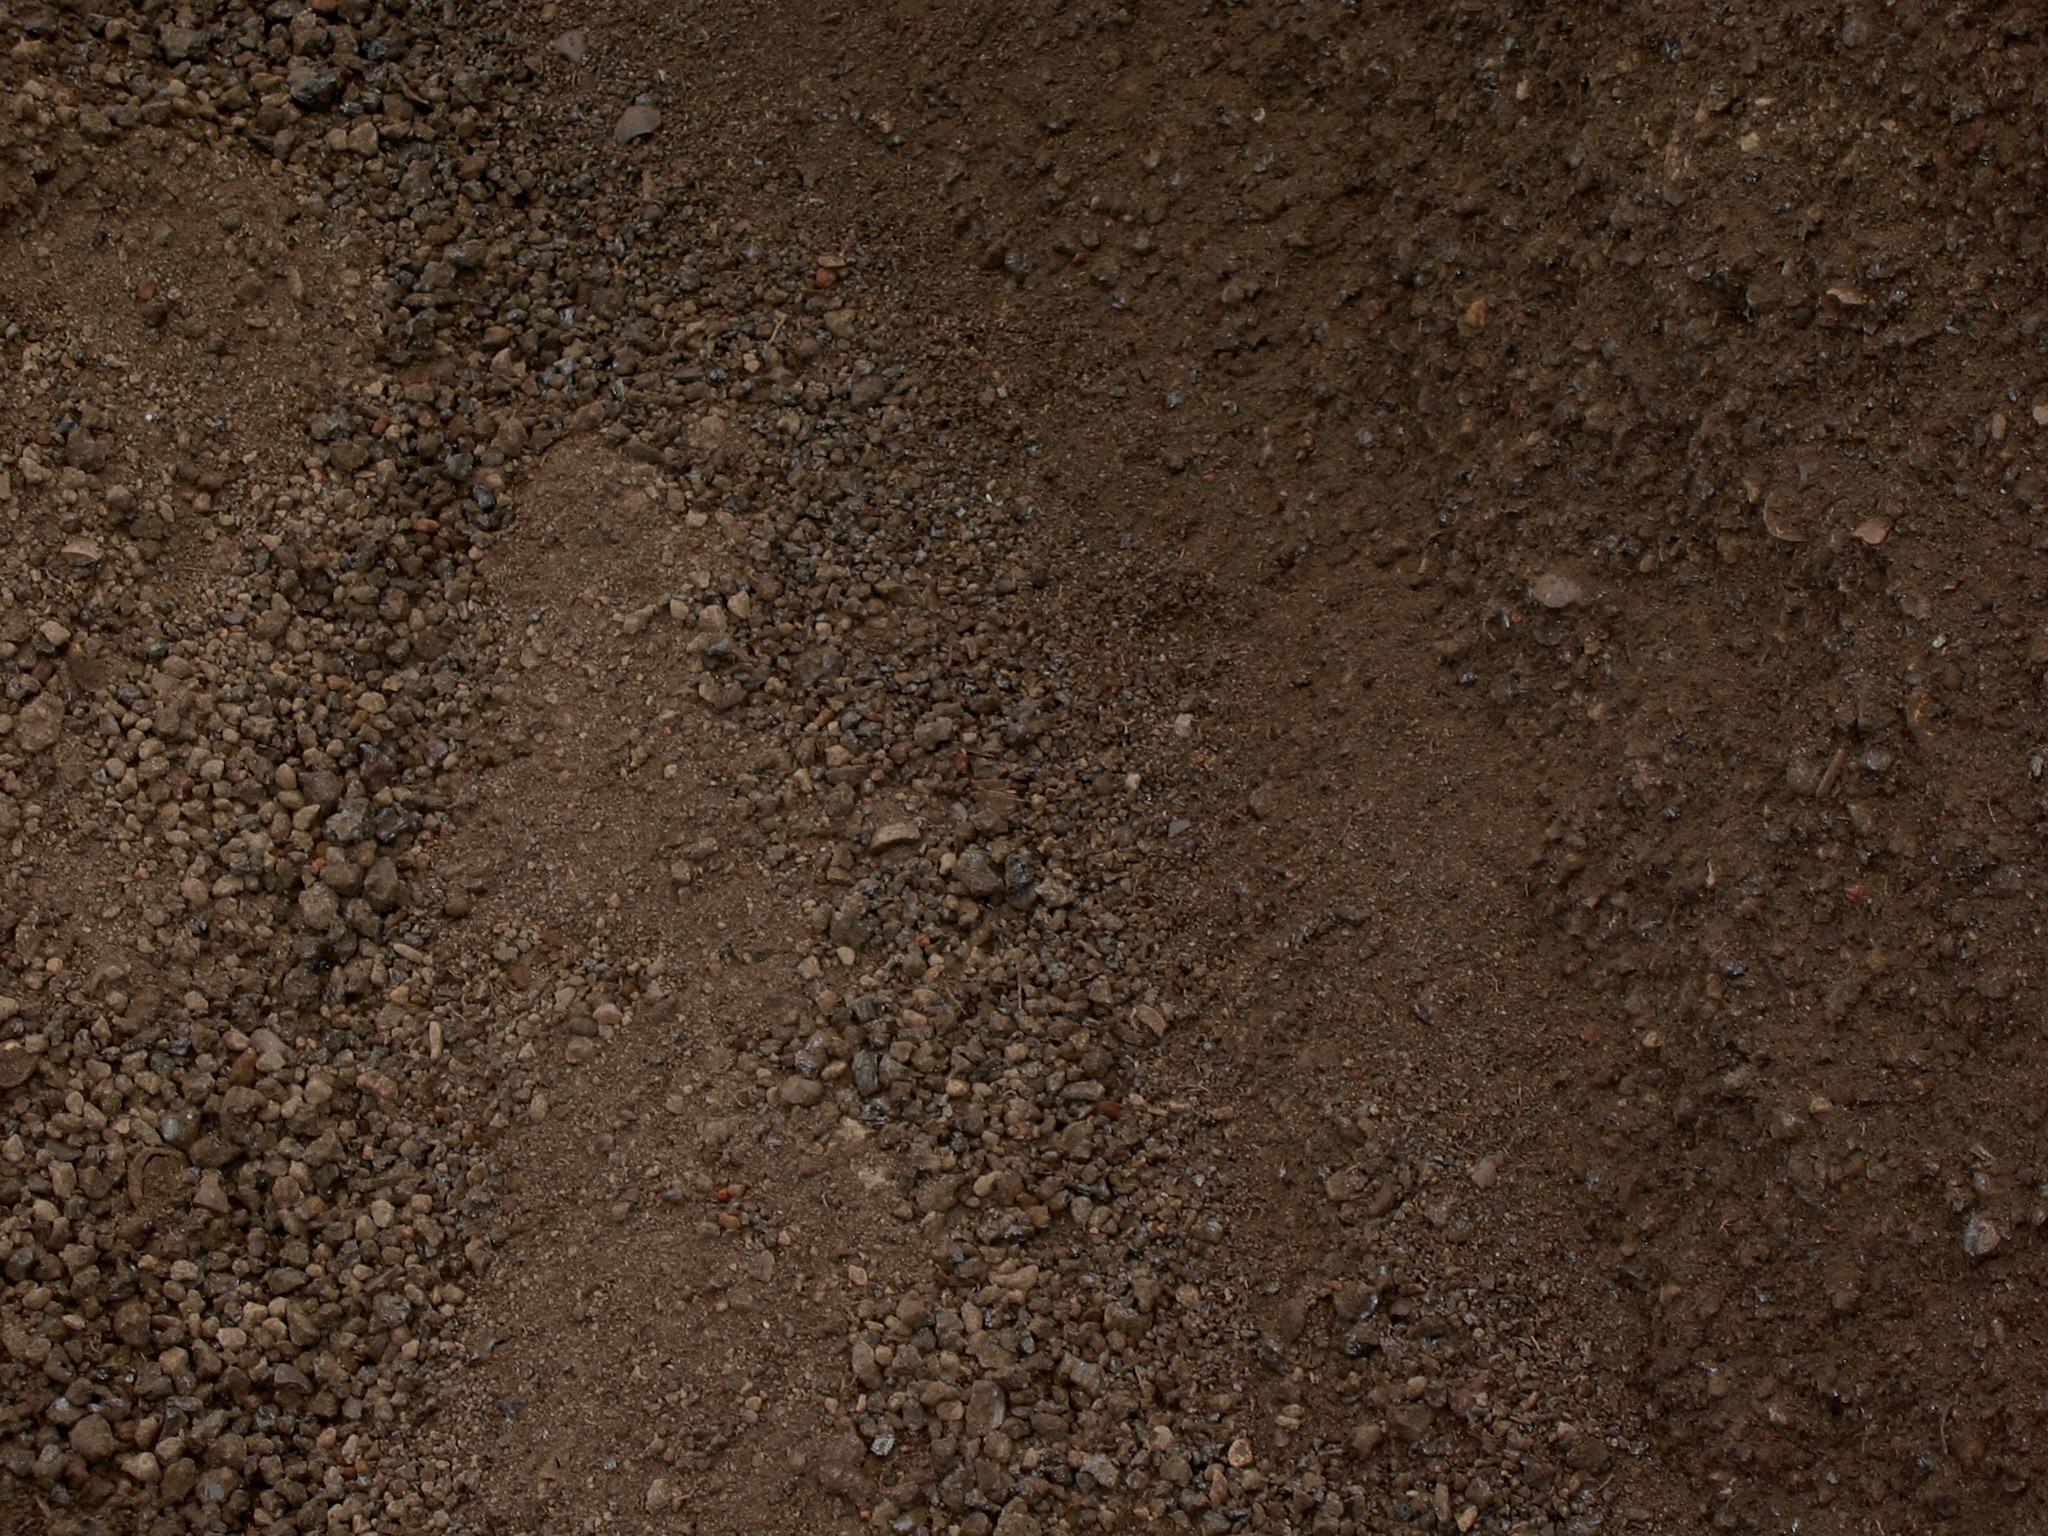 Ground Earth Texture Download Photo Background Ground Texture